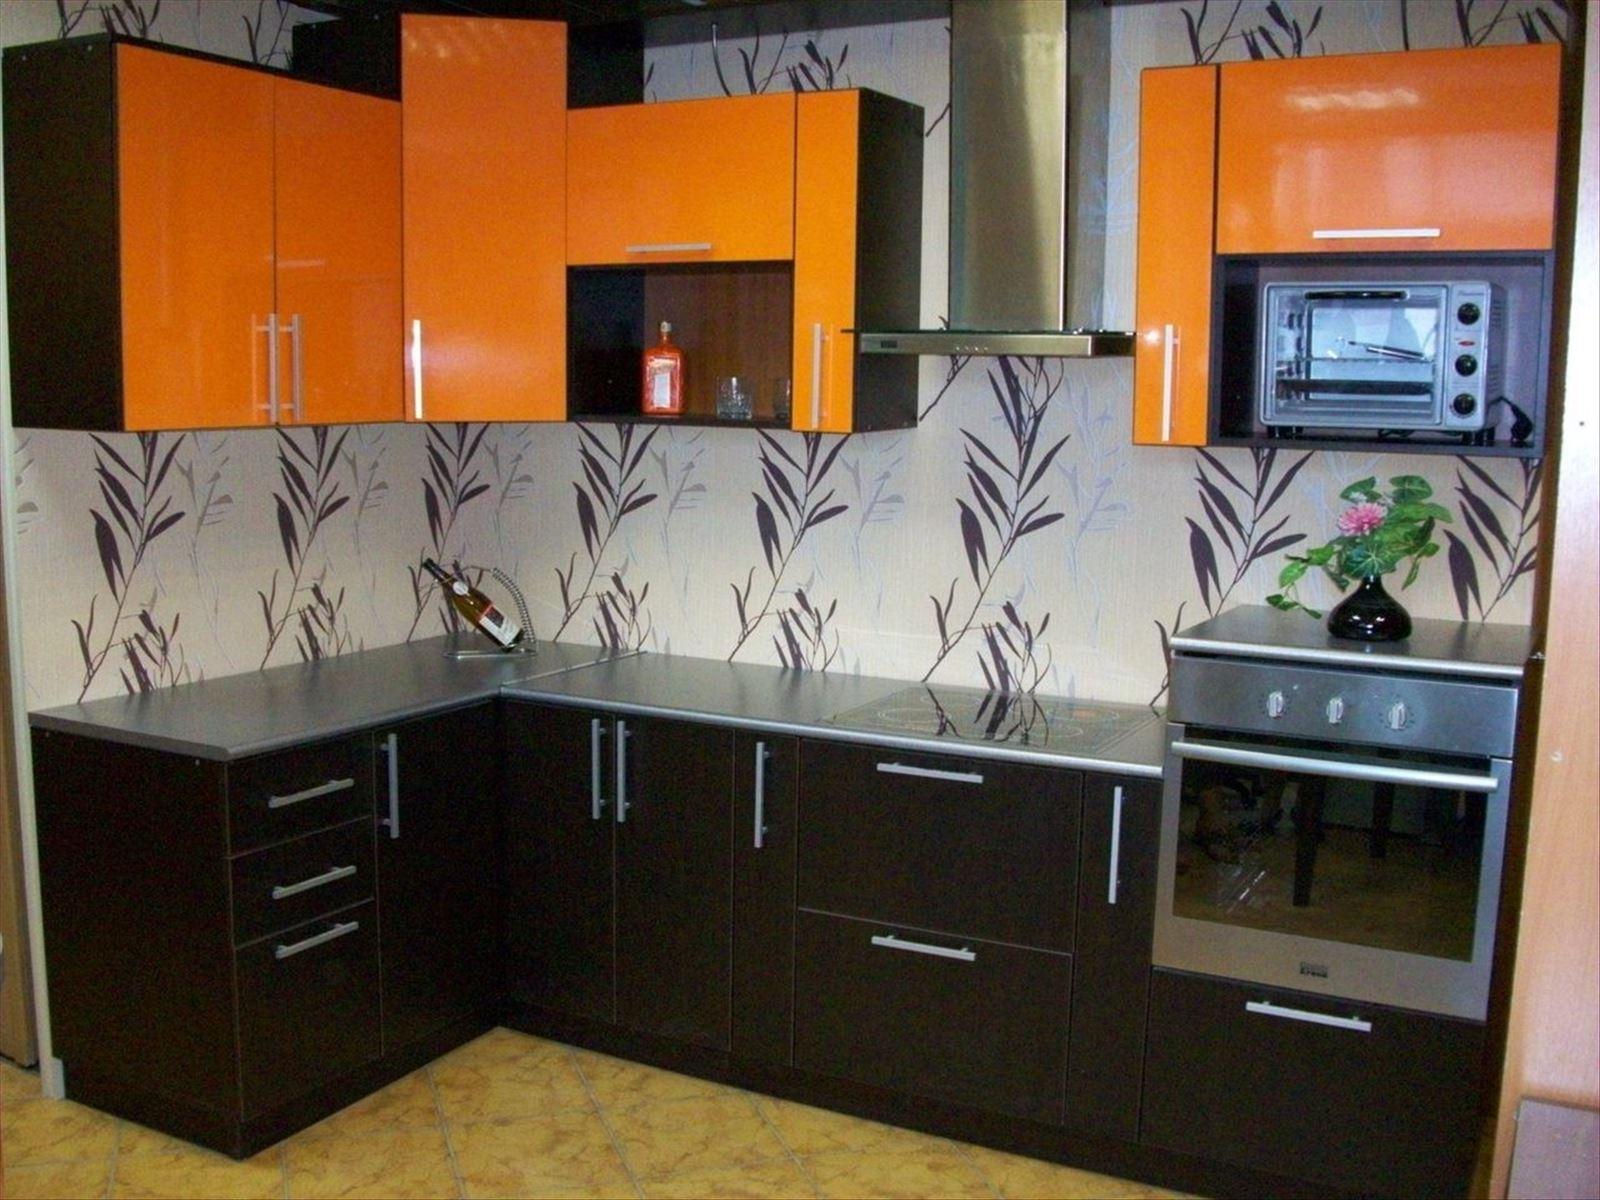 Кухня шоколадного цвета на заказ от производителя.